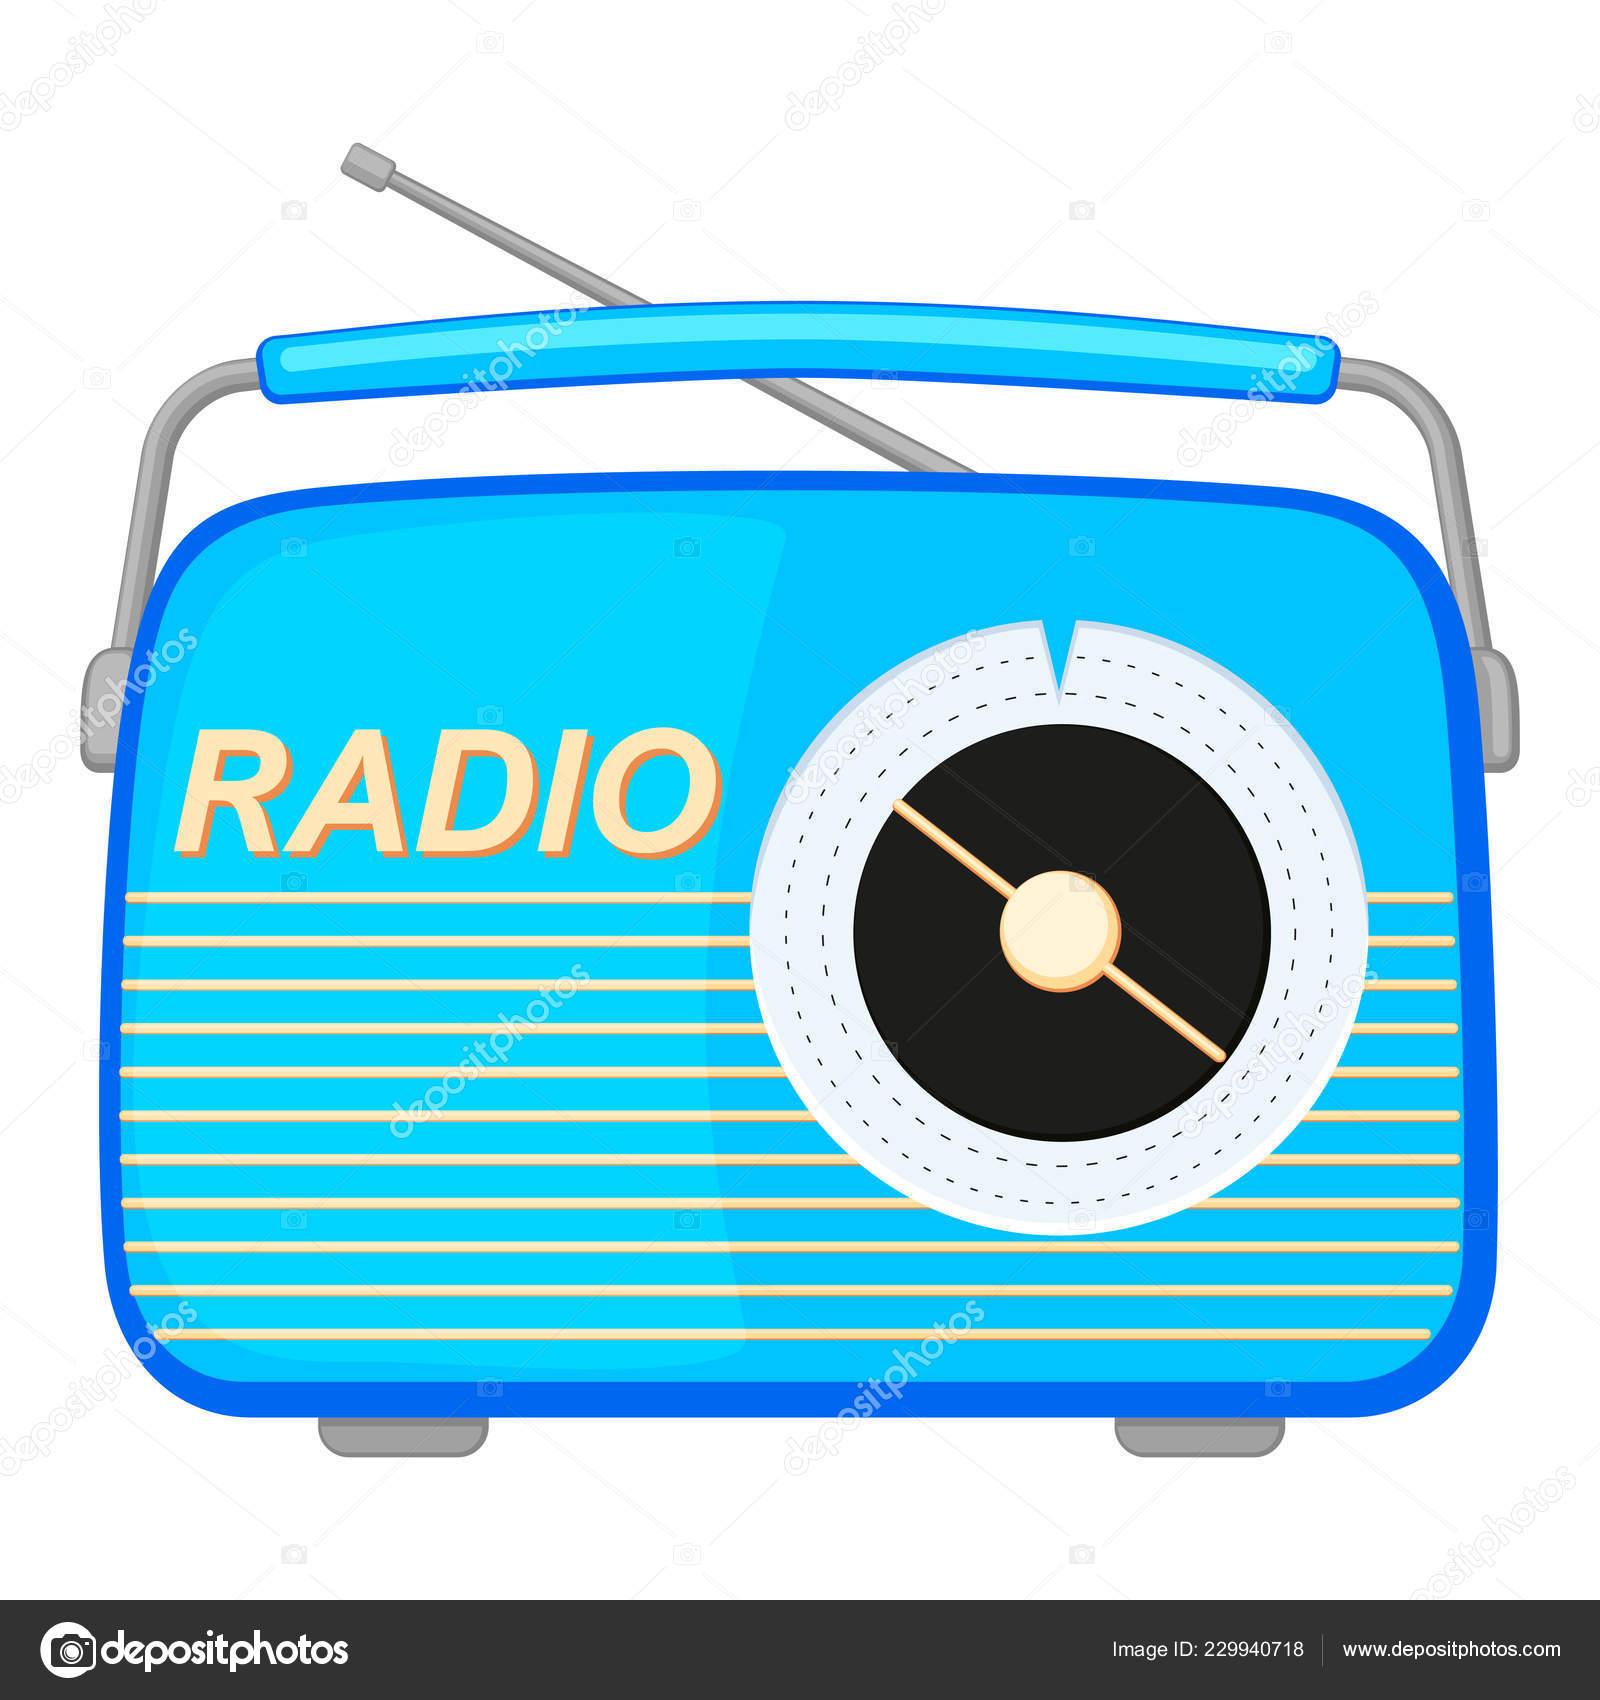 Radio Cartoon Retro Colorful Cartoon Retro Radio Stock Vector C Bessyana 229940718